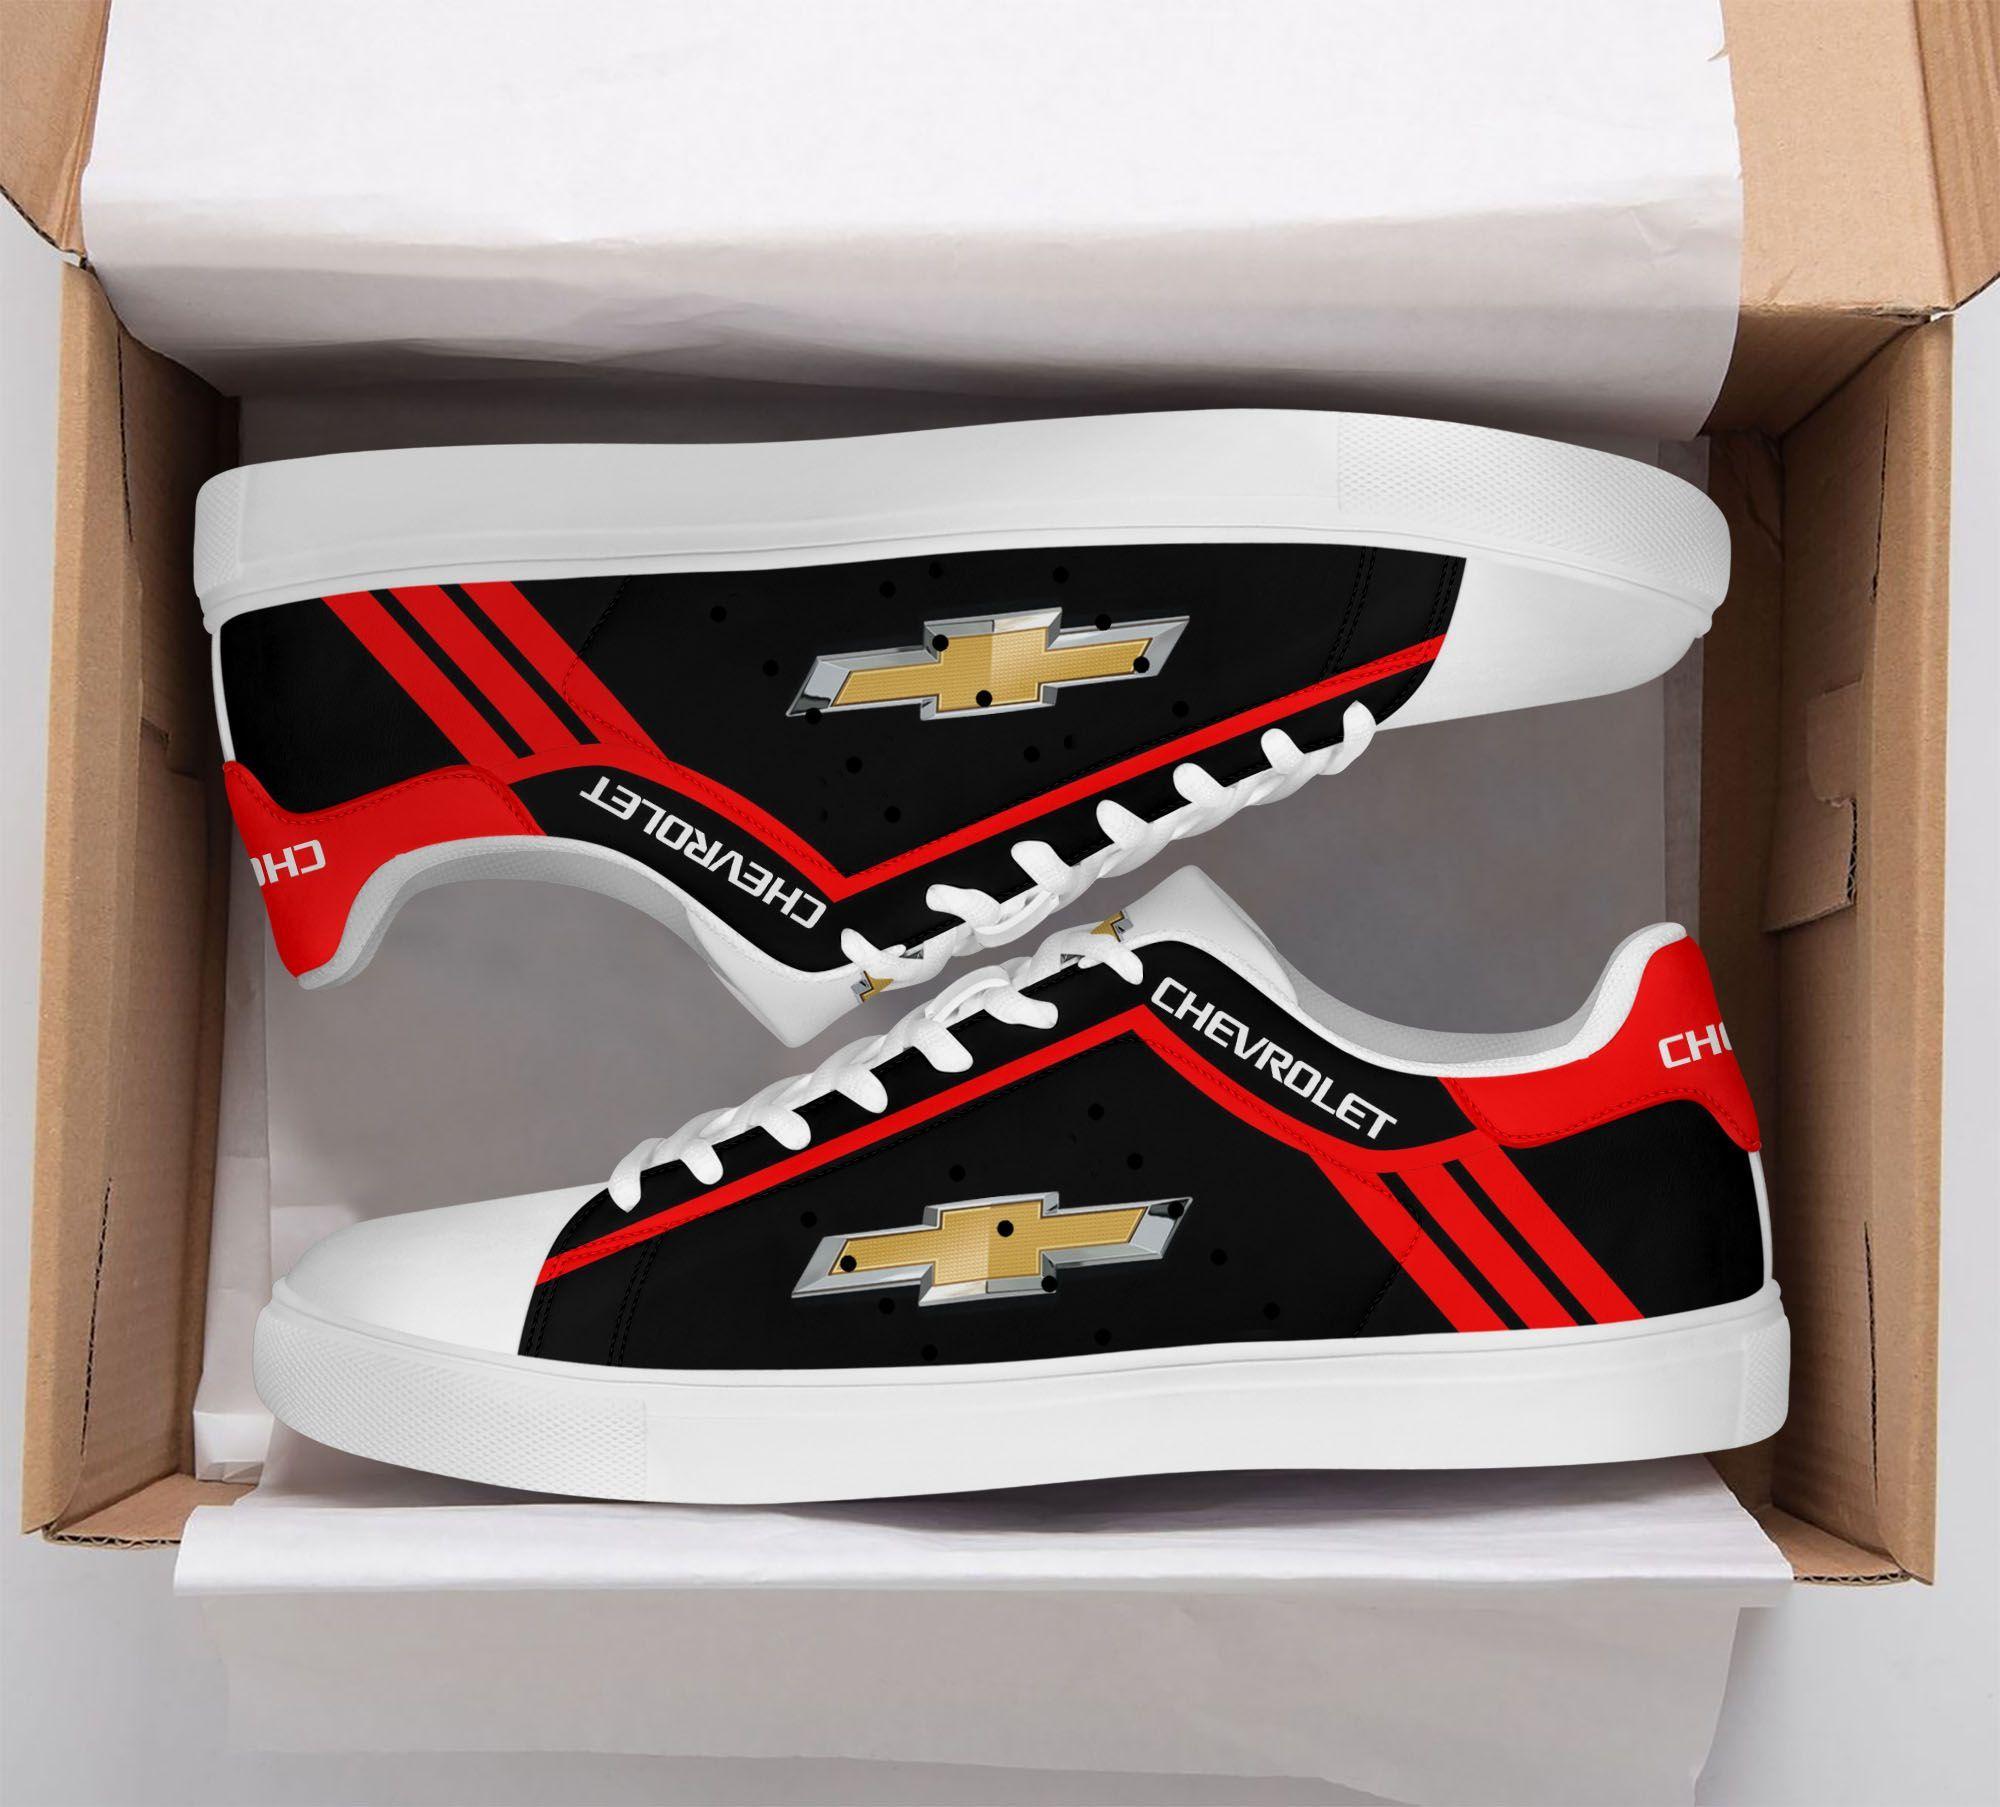 Chevrolet Silverado black and red version Stan Smith Shoes